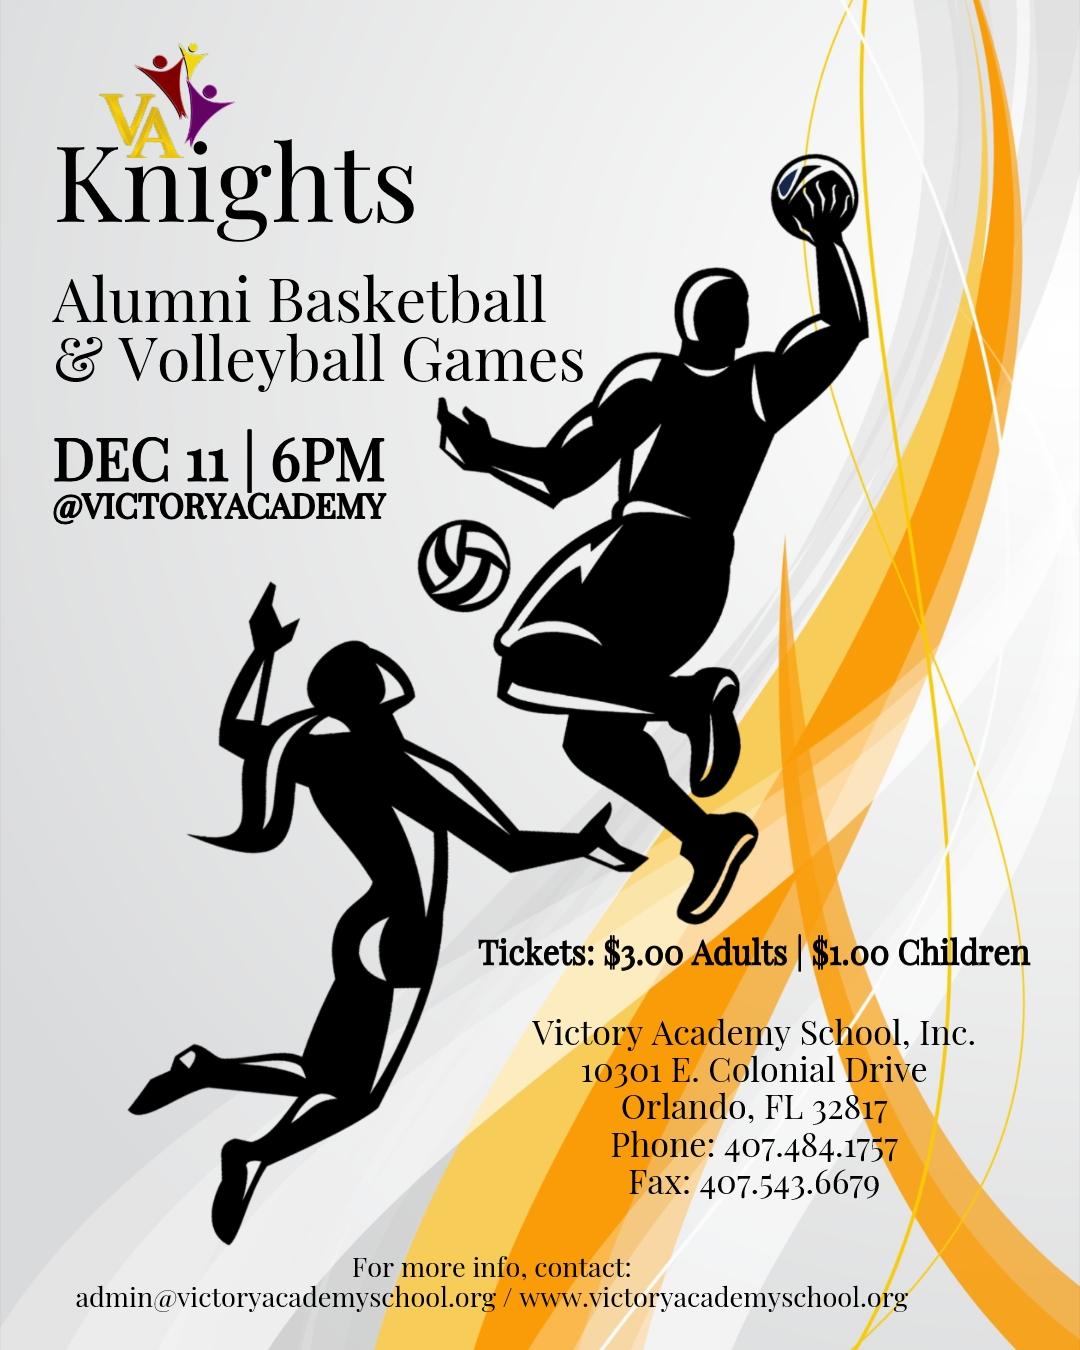 Victory Academy (Knights) Alumni Basketball & Volleyball Games